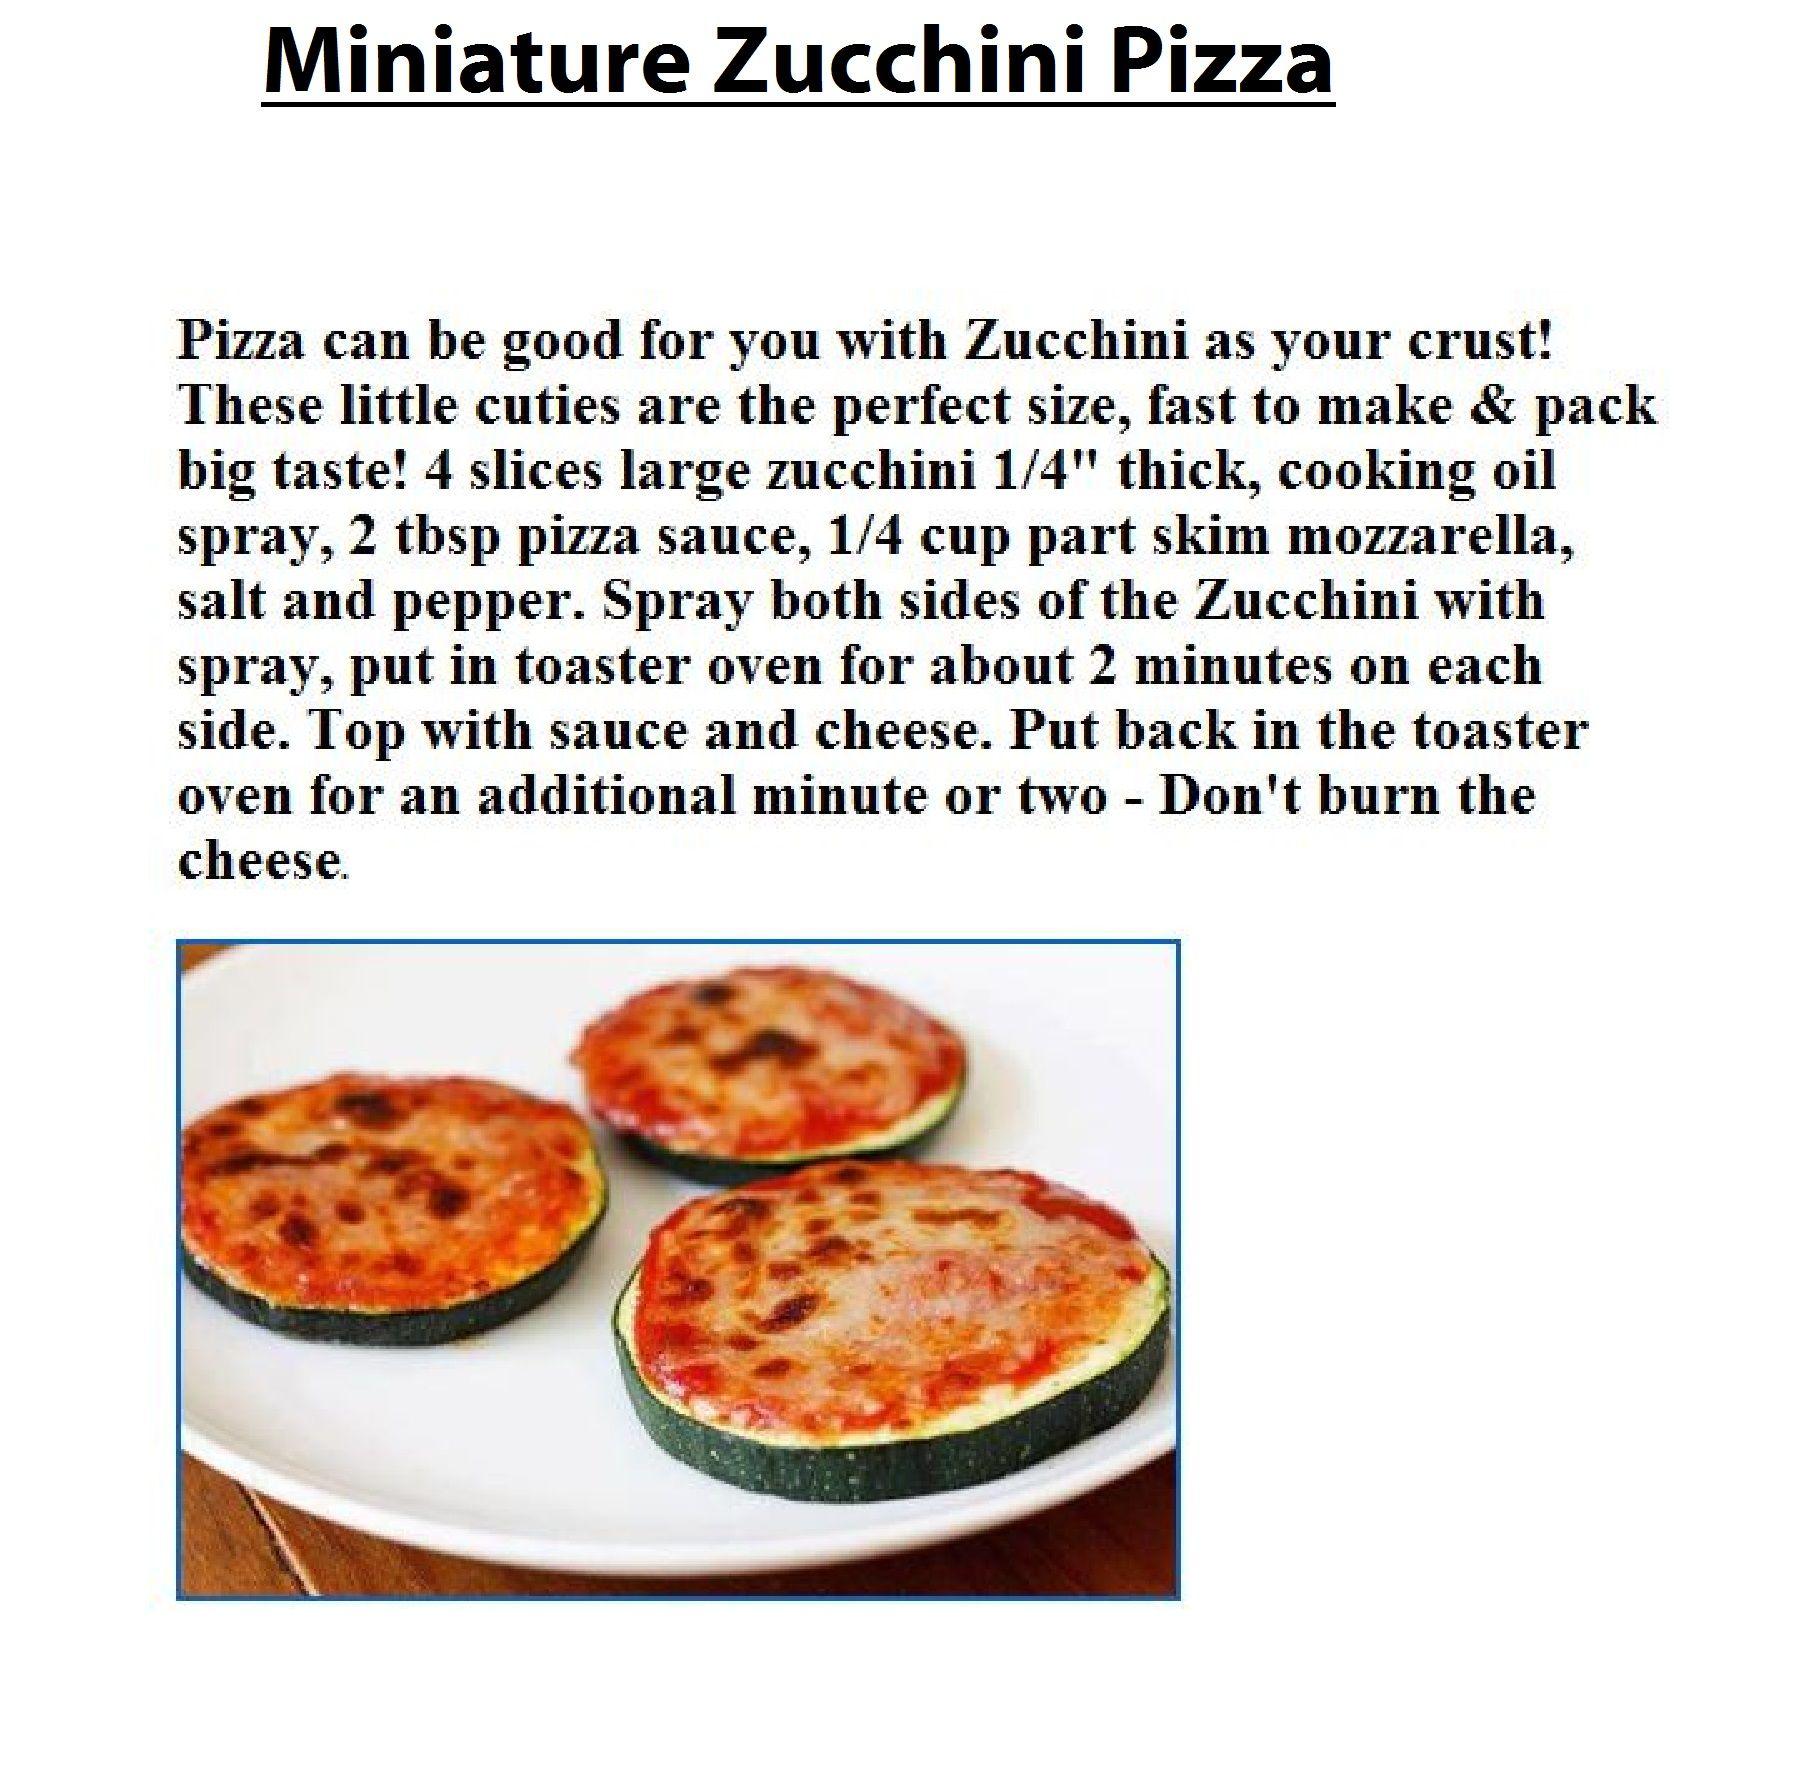 Miniature Zucchini Pizza